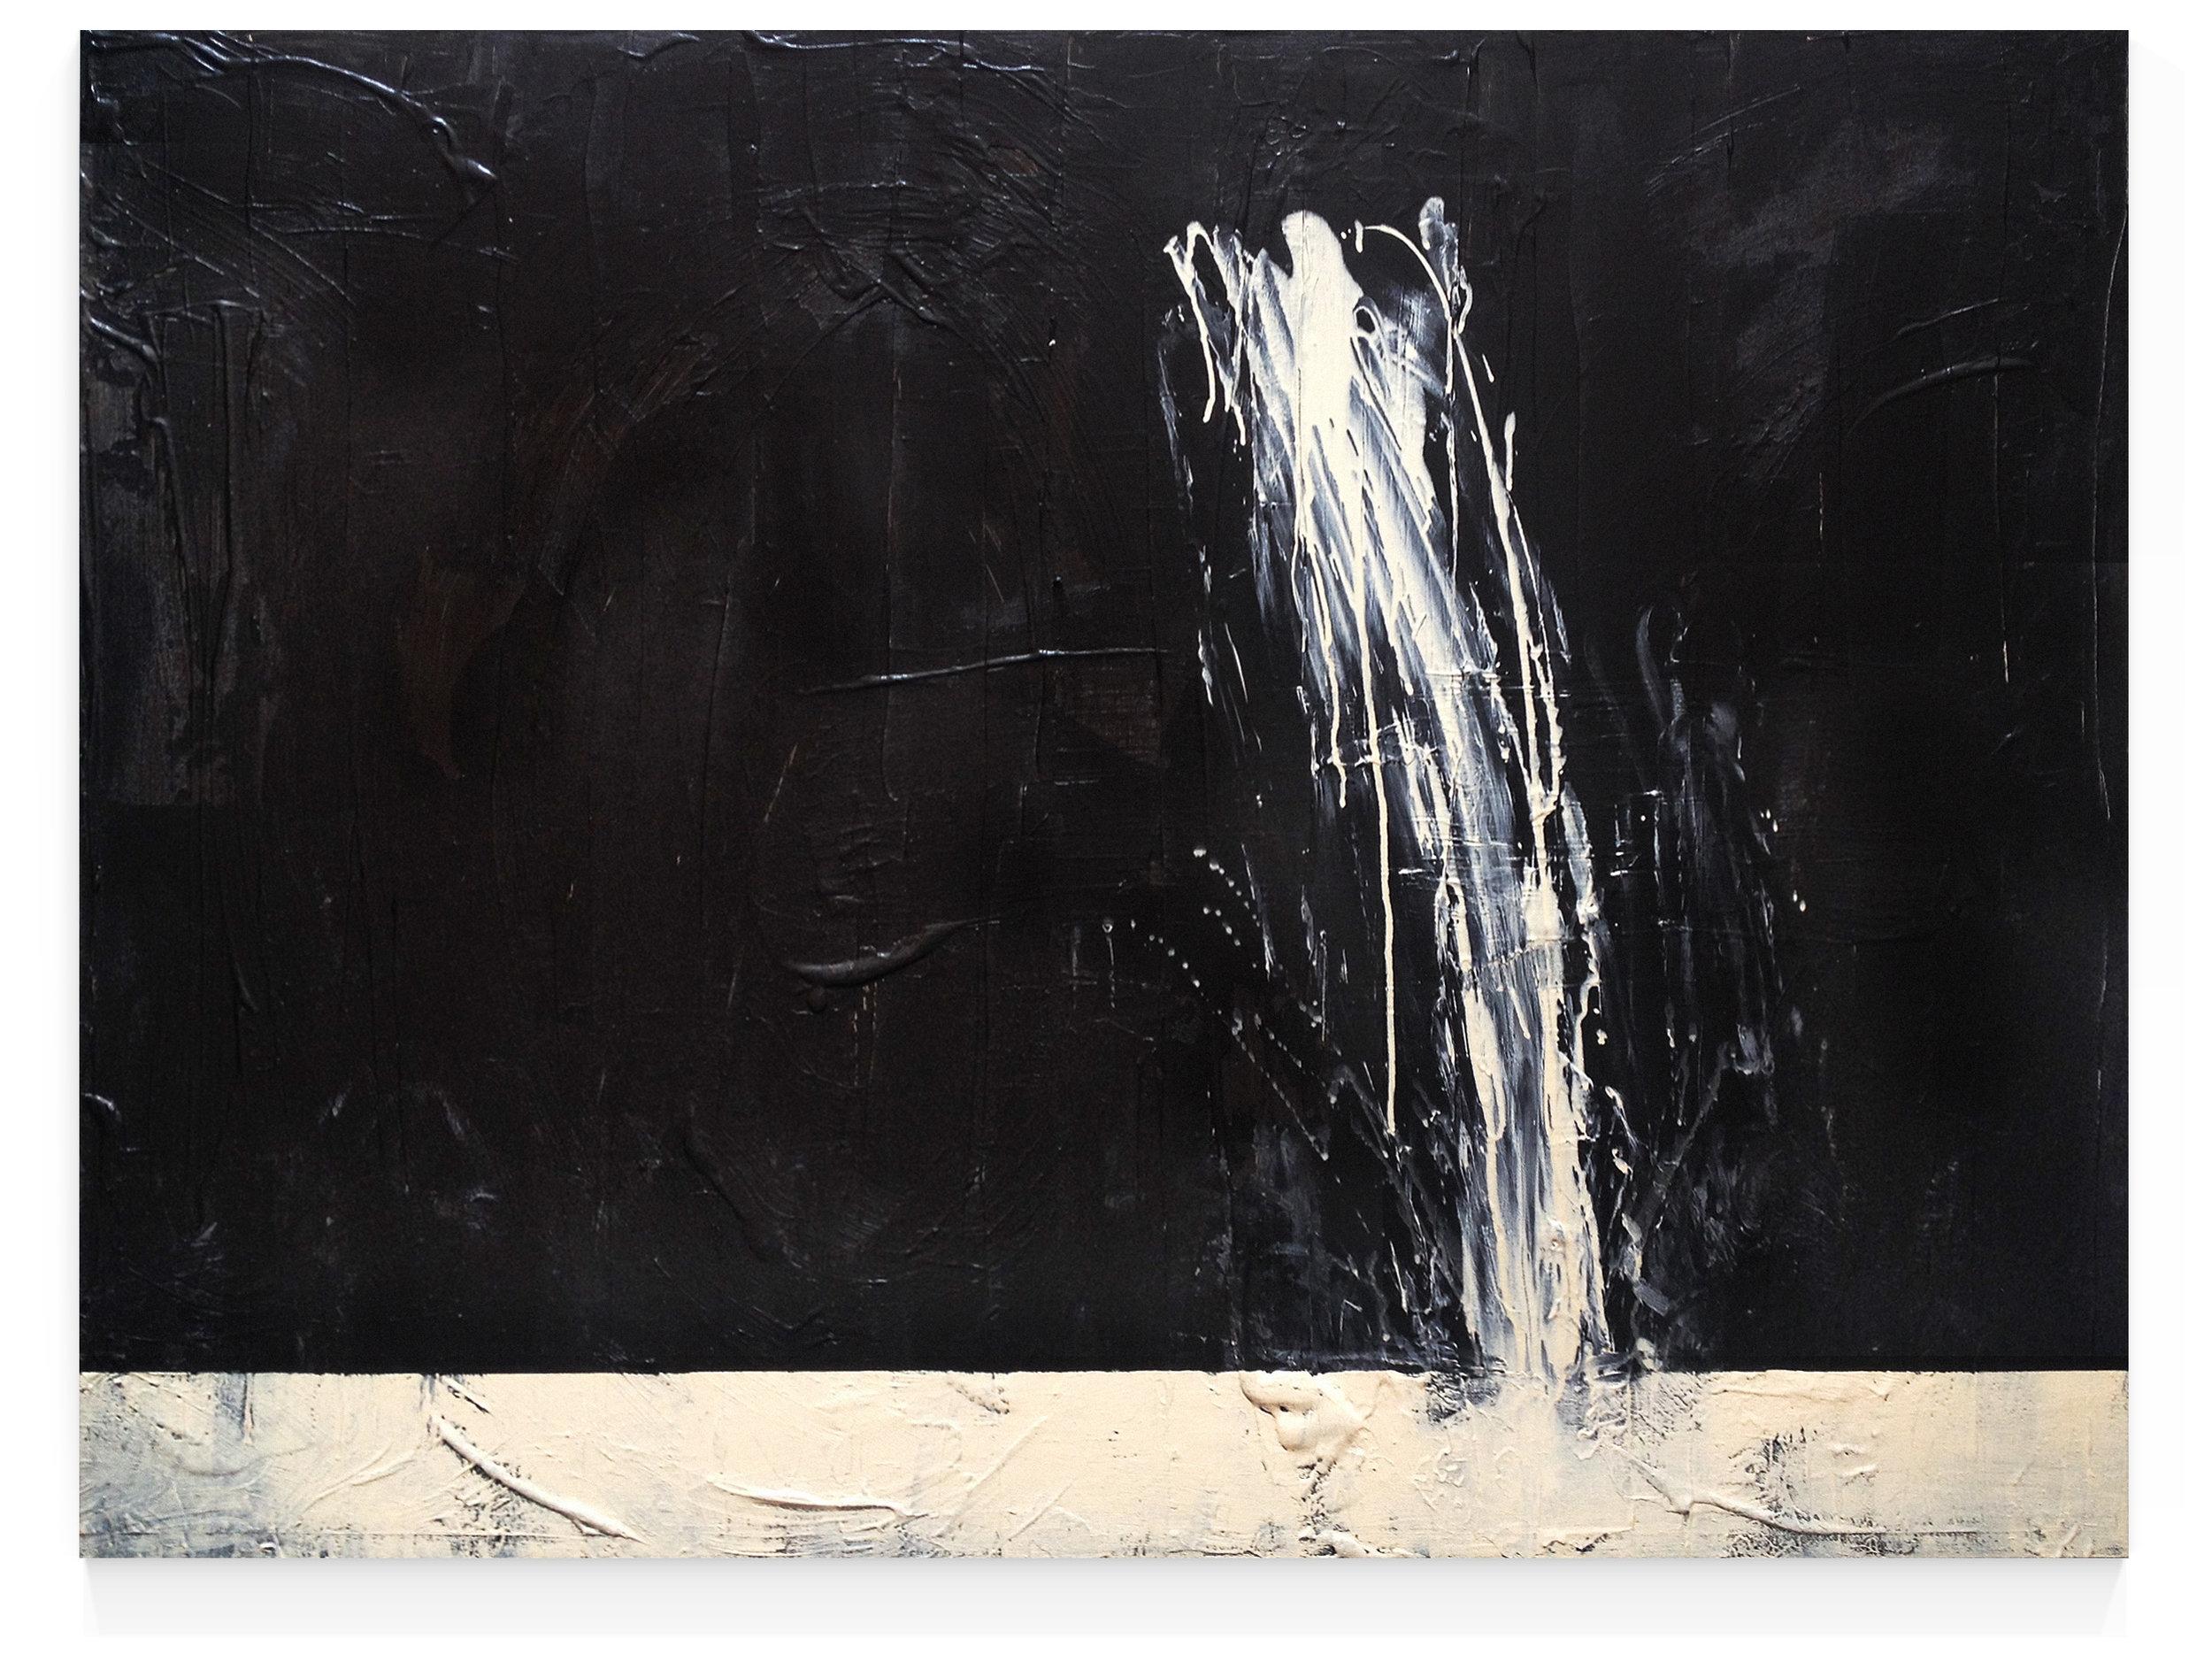 Dos Líneas Blancas — Diego Berjon